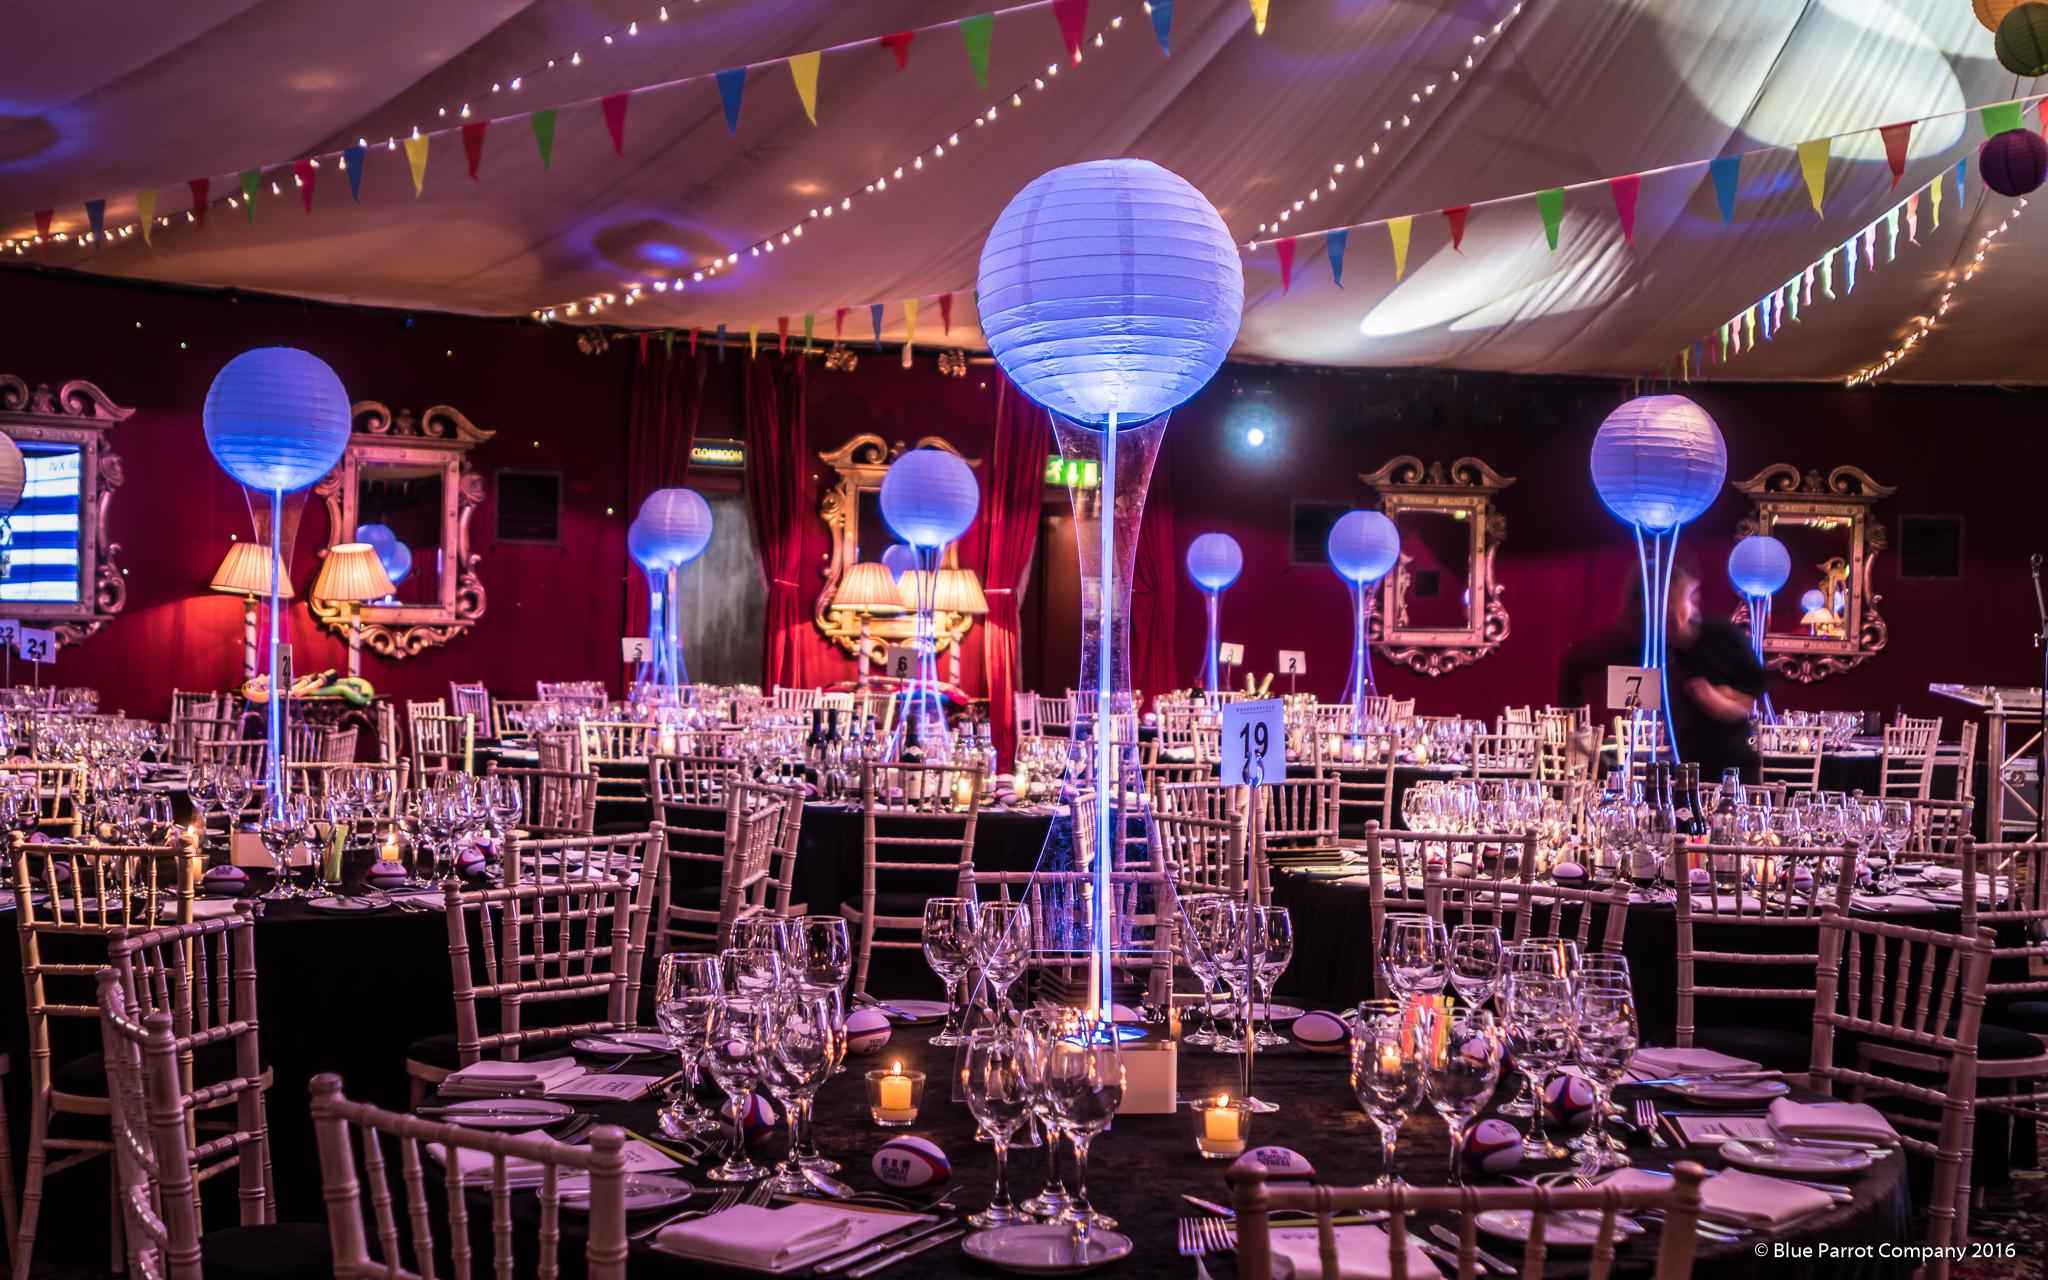 Festival Lantern Table Centres at Prestonfield